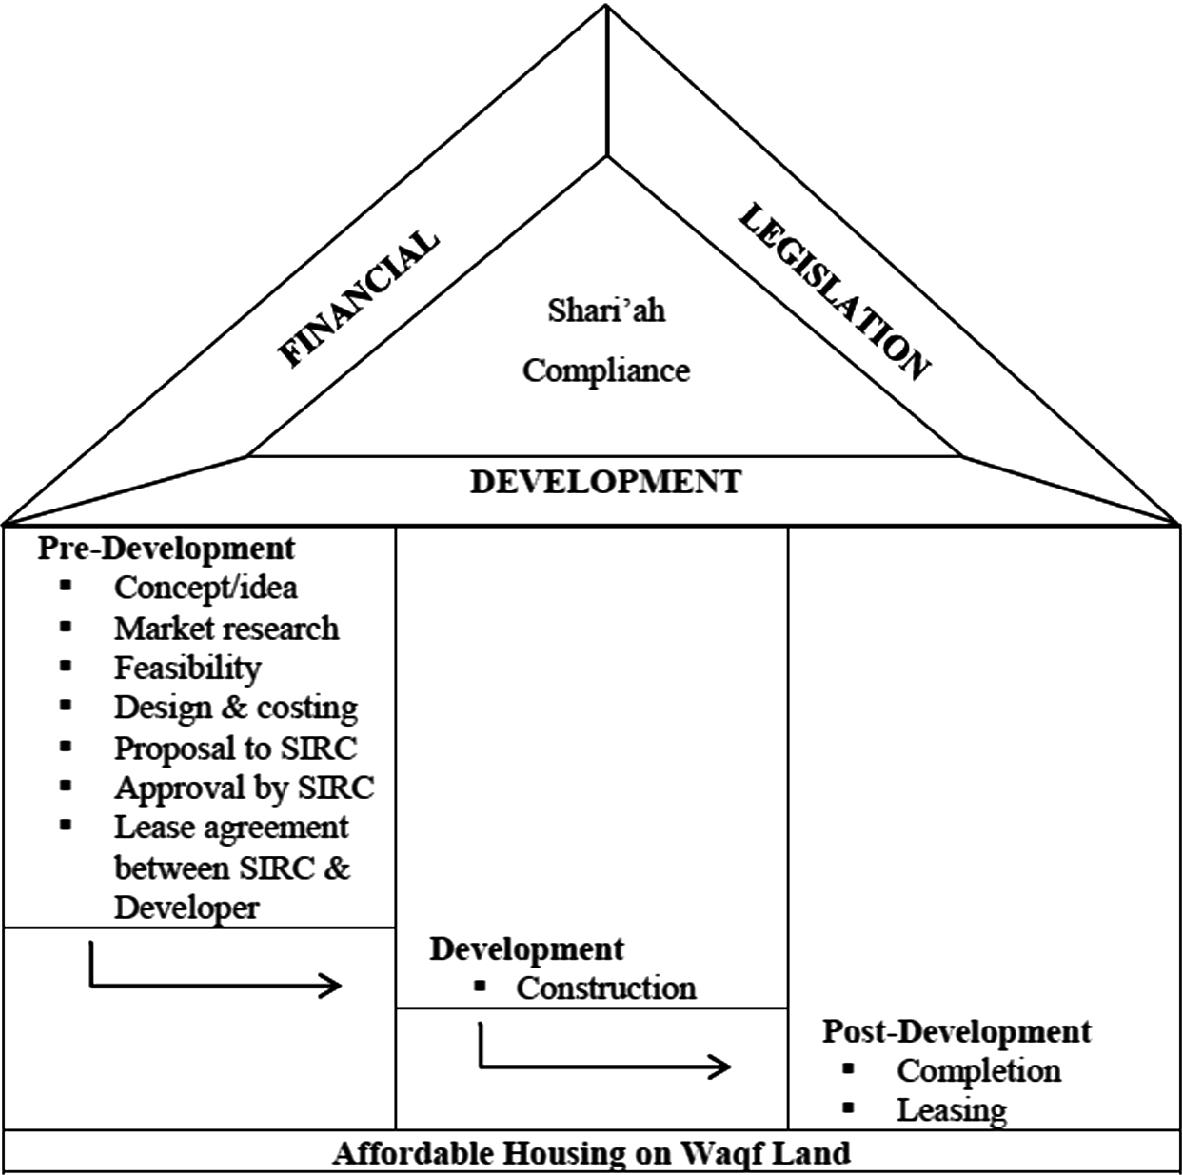 Development Framework for Affordable Housing on Waqf Land